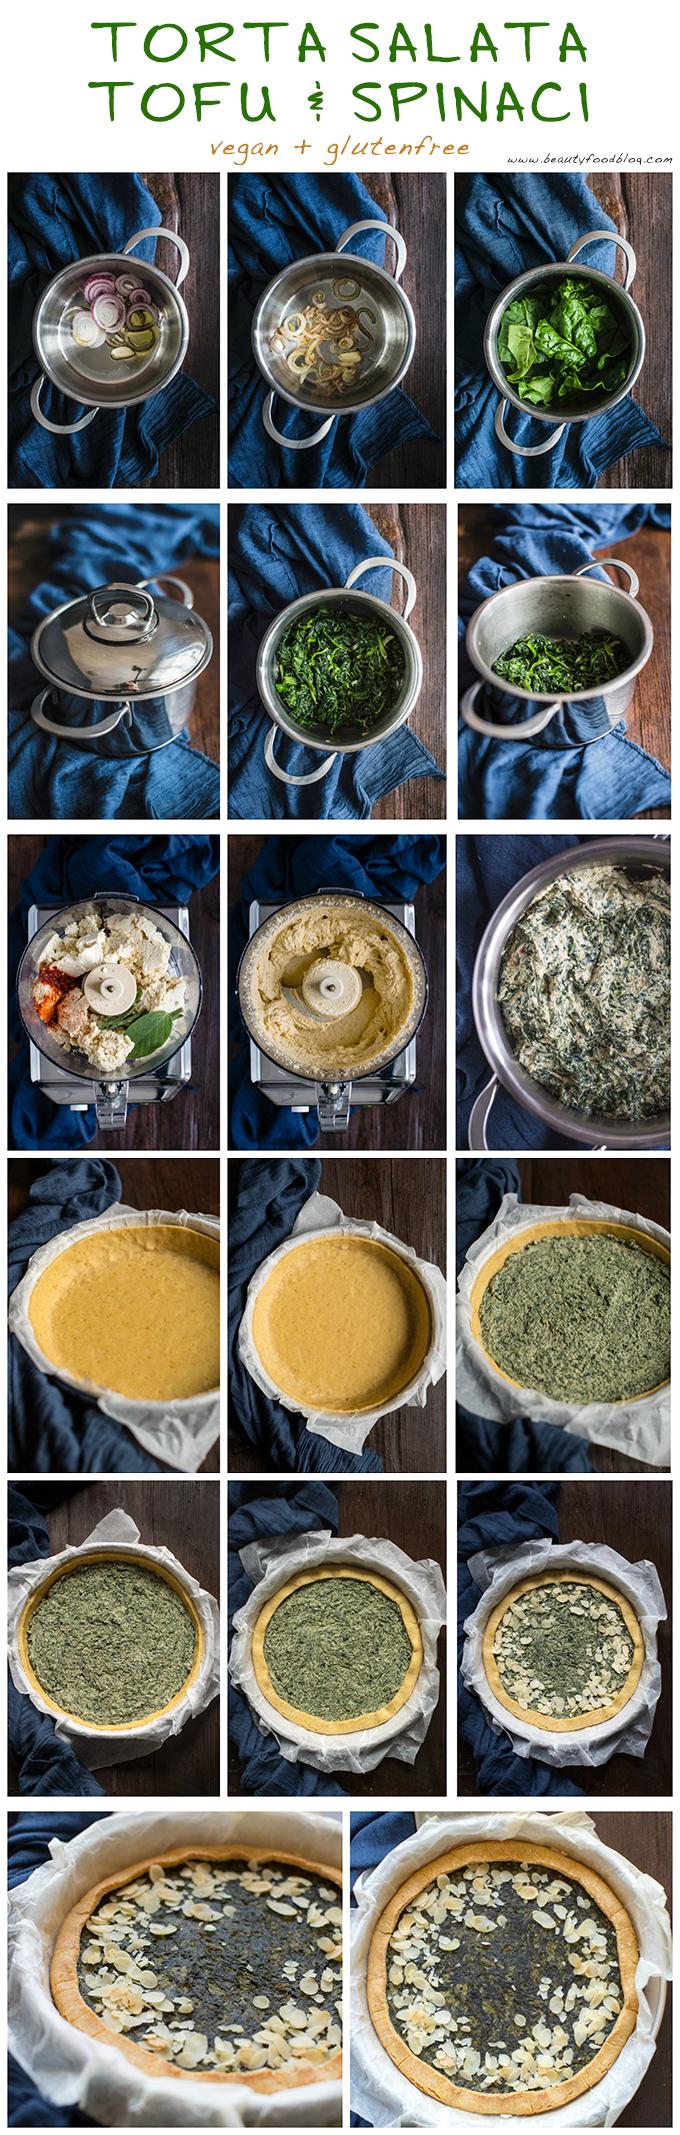 how to vegan glutenfree spinach tofu quiche recipe - come preparare torta salata spinaci e tofu vegan senza glutine senza uova- torta pasqualina senza ricotta vegana